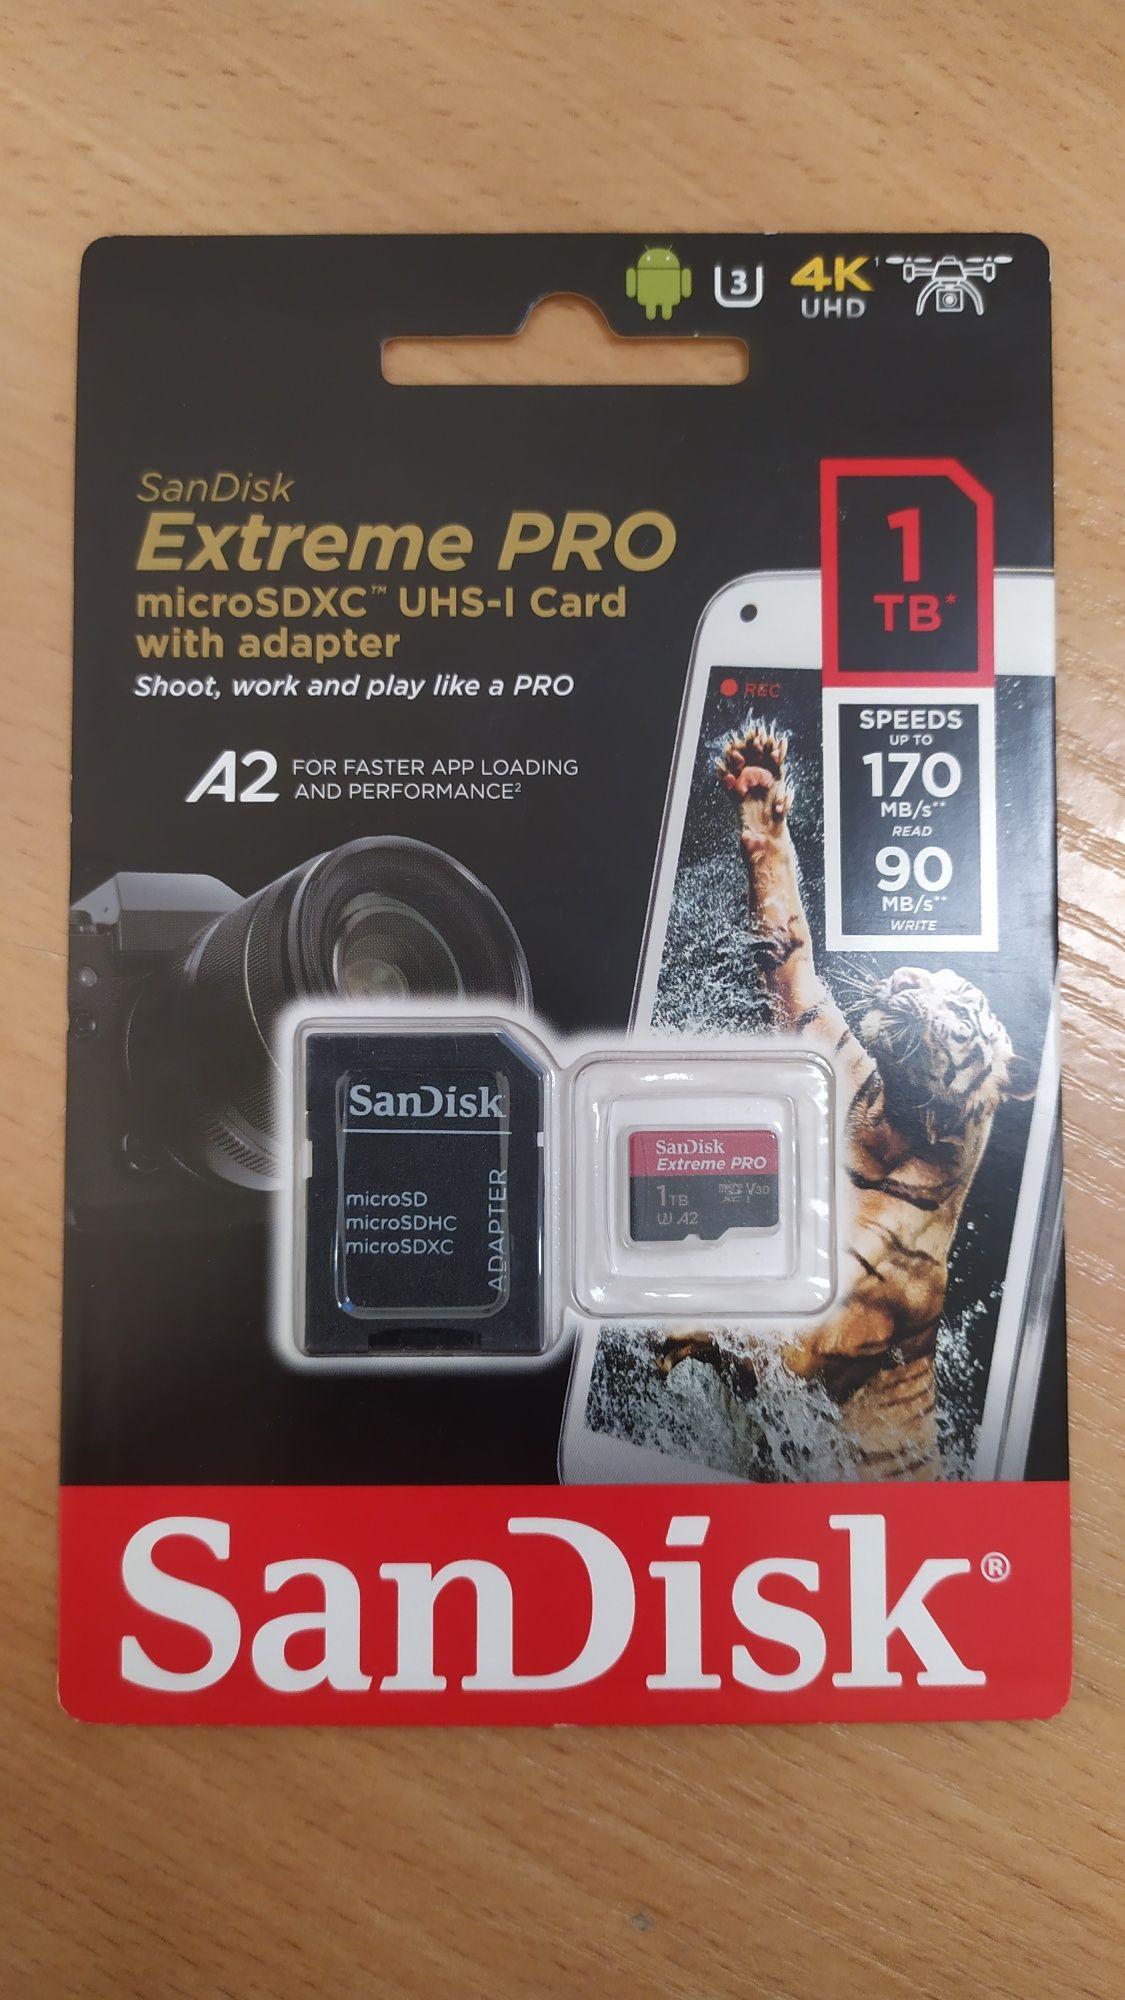 SanDisk Extreme Pro microSDXC UHS-I Card A2 4K UHD 1Tb